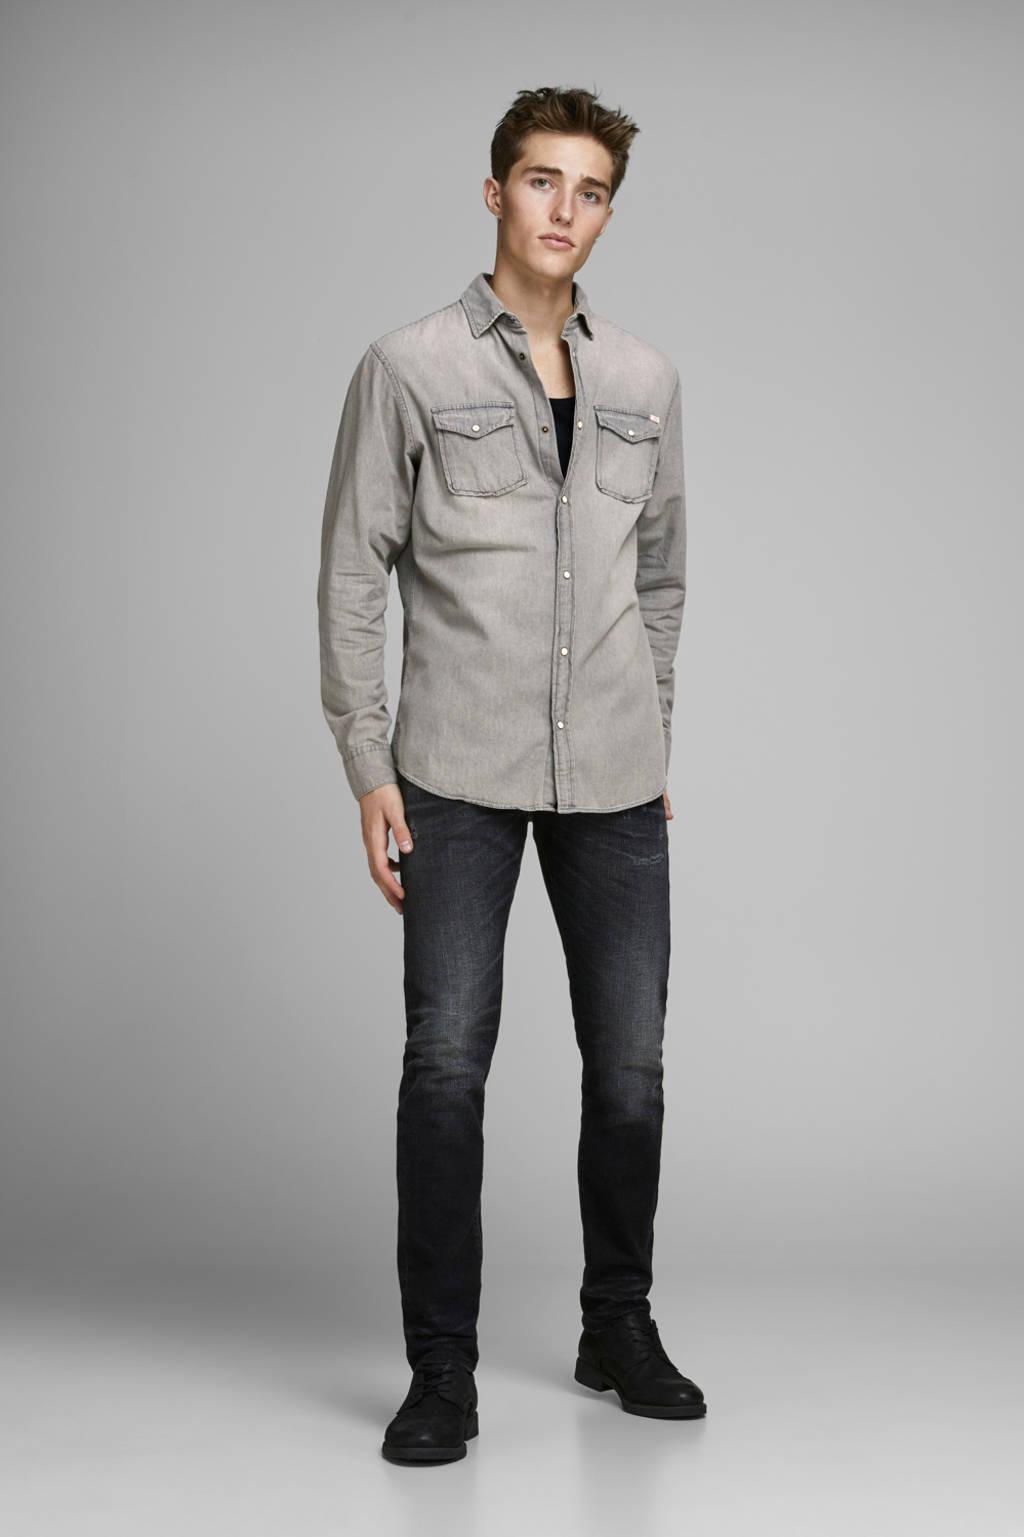 JACK & JONES ESSENTIALS slim fit overhemd JJESHERIDAN light grey denim, Light Grey Denim